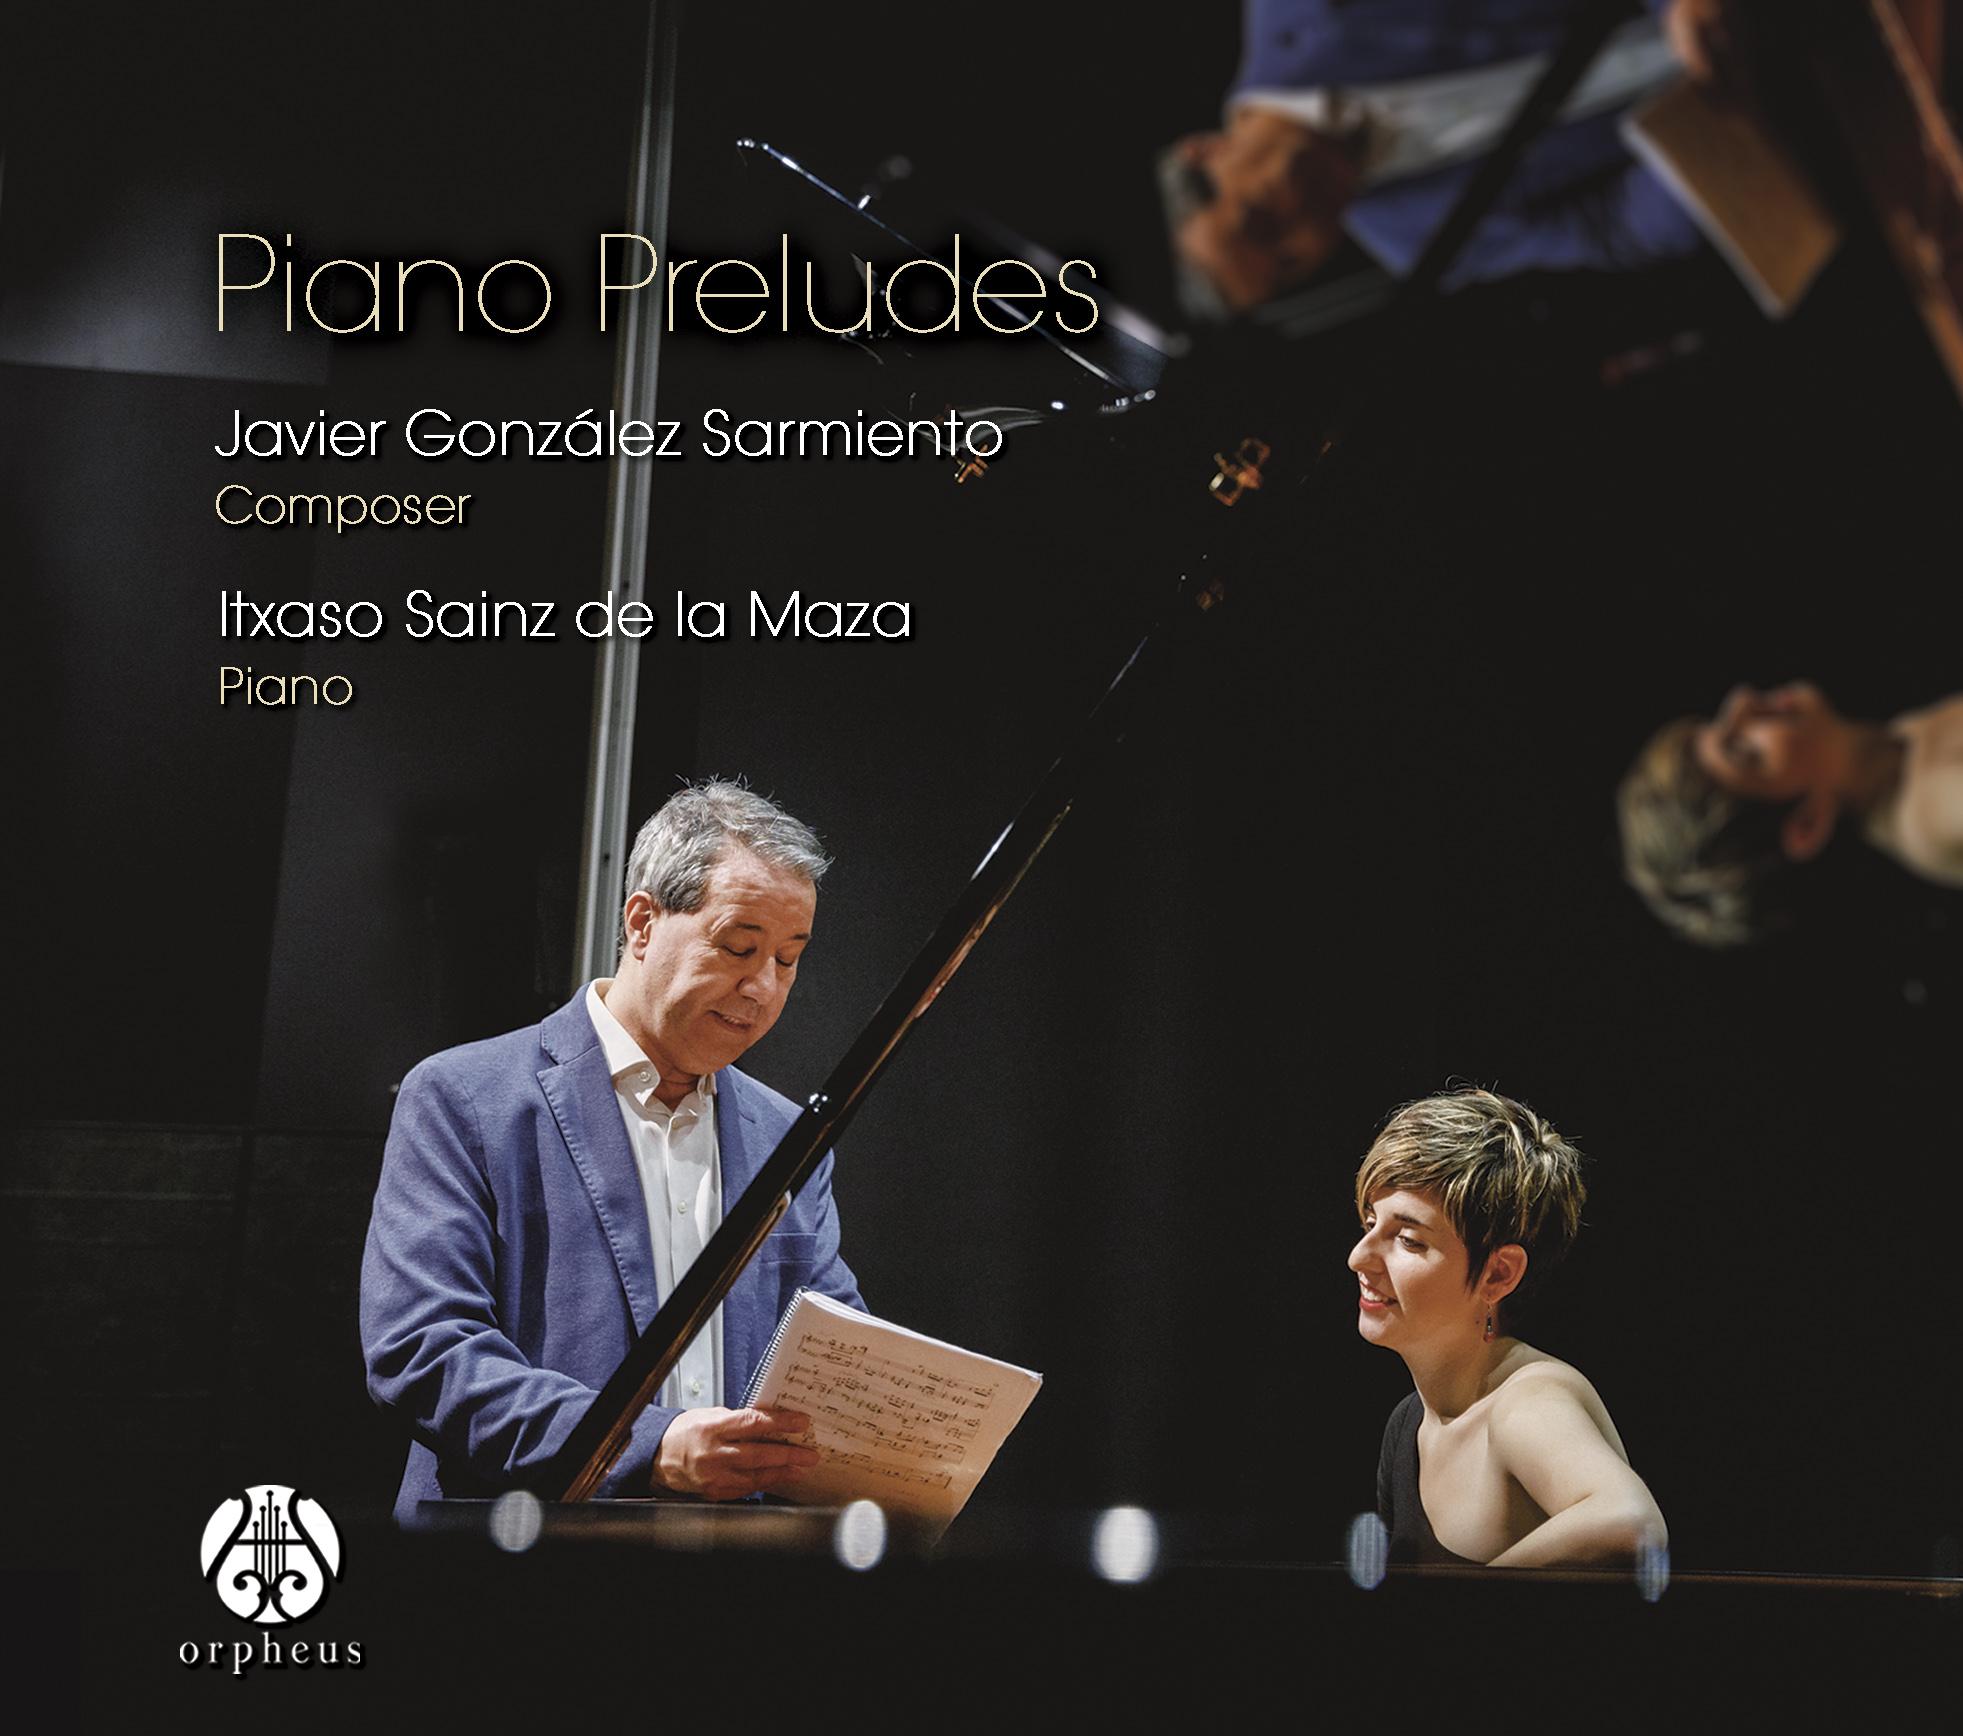 Javier-González-Sarmiento-Piano-Preludes